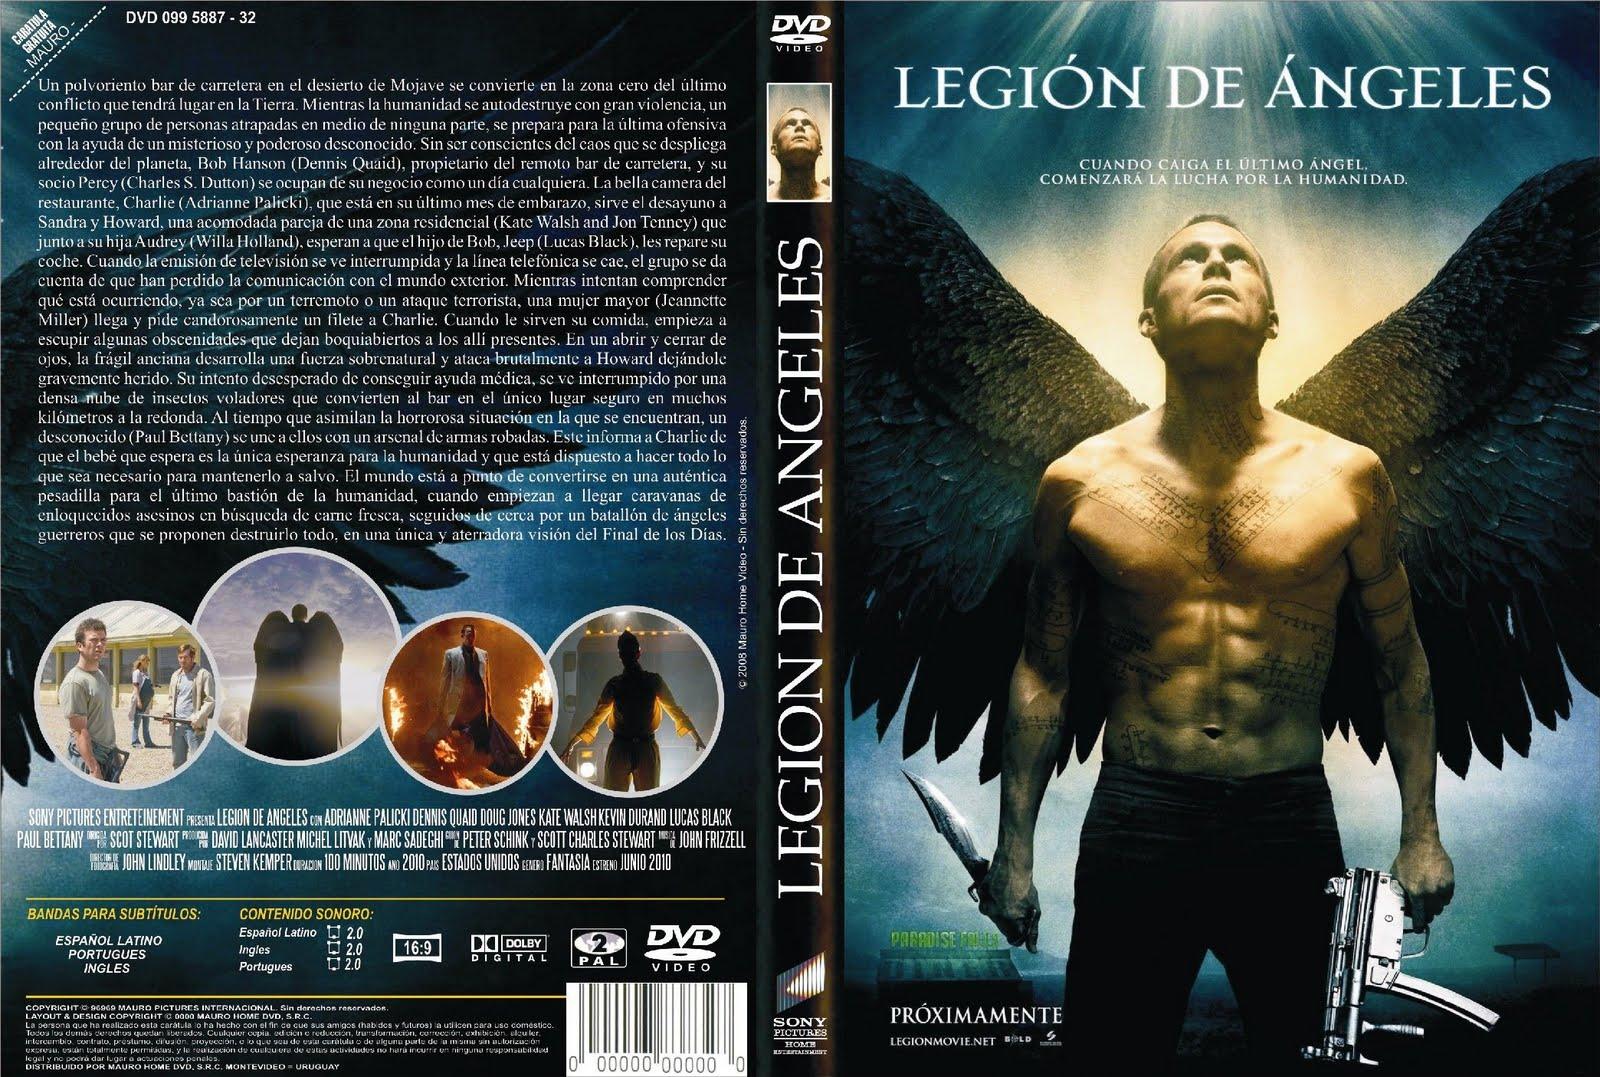 Legión de Ángeles (2010) [Dvdrip Latino] [Zippyshare]